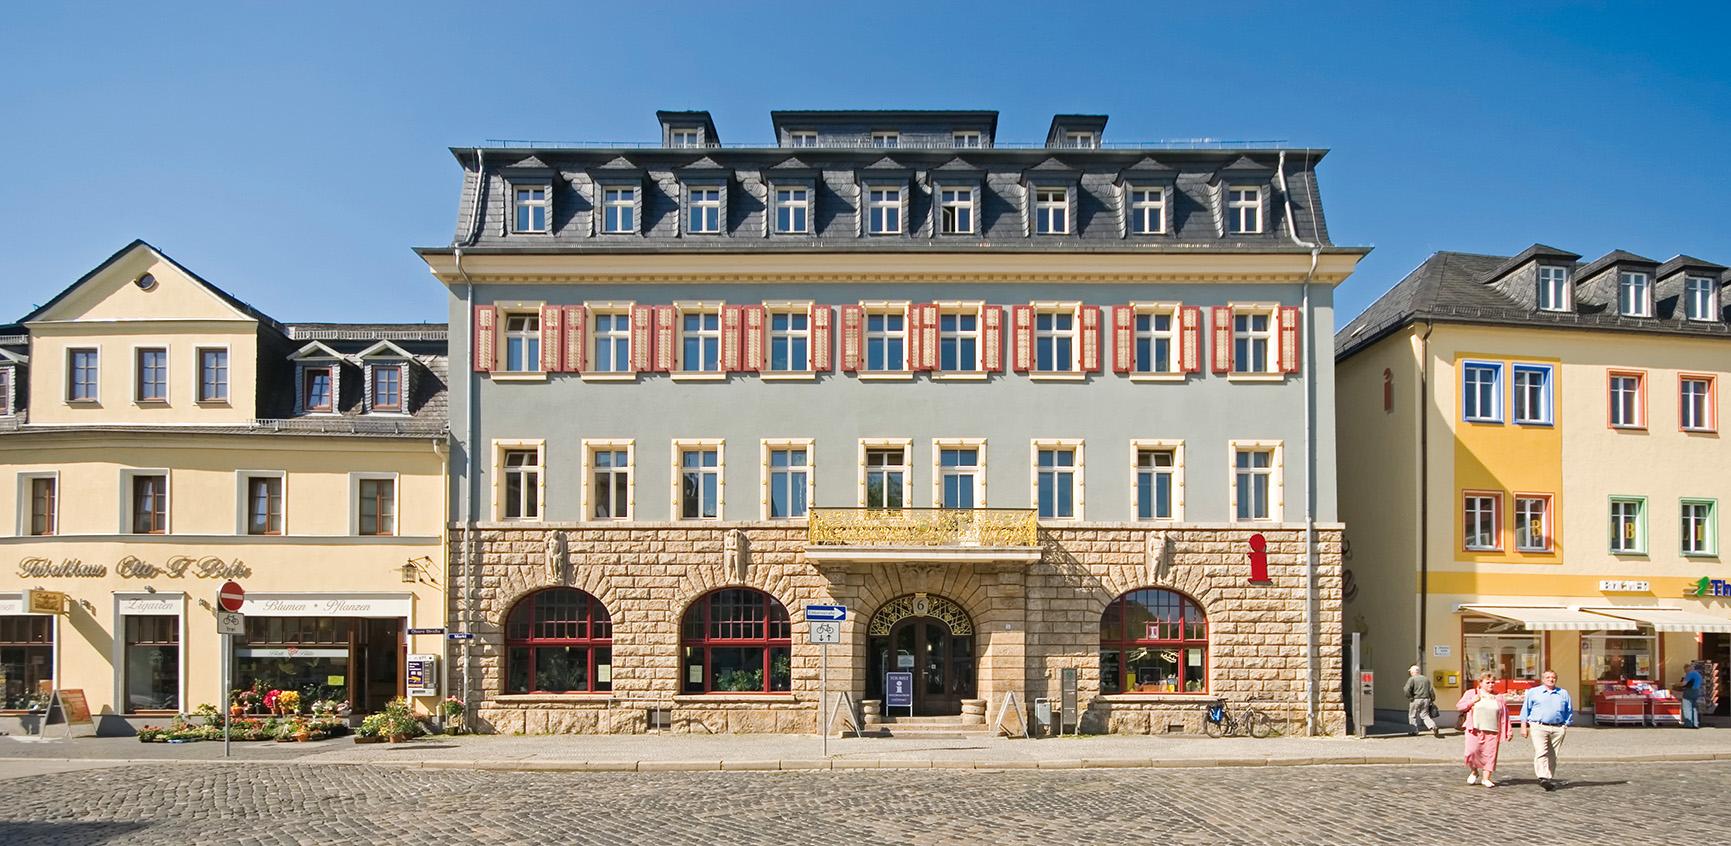 Tourist-Information Saalfeld - Saalfelder Feengrotten und Tourismus GmbH, Michael Miltzow